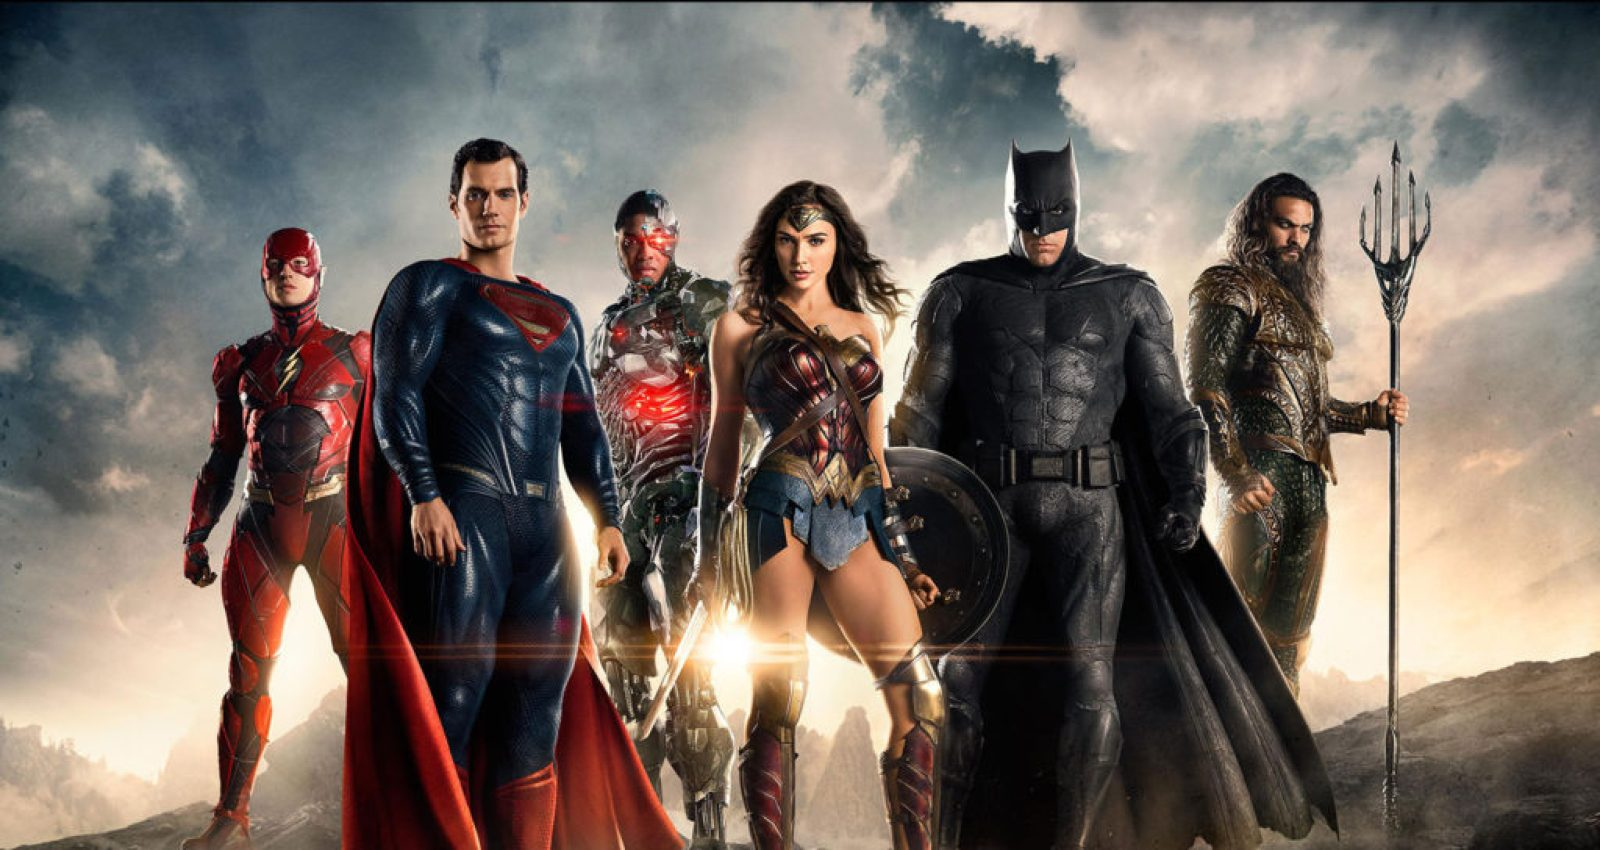 2017's Justice League Movie